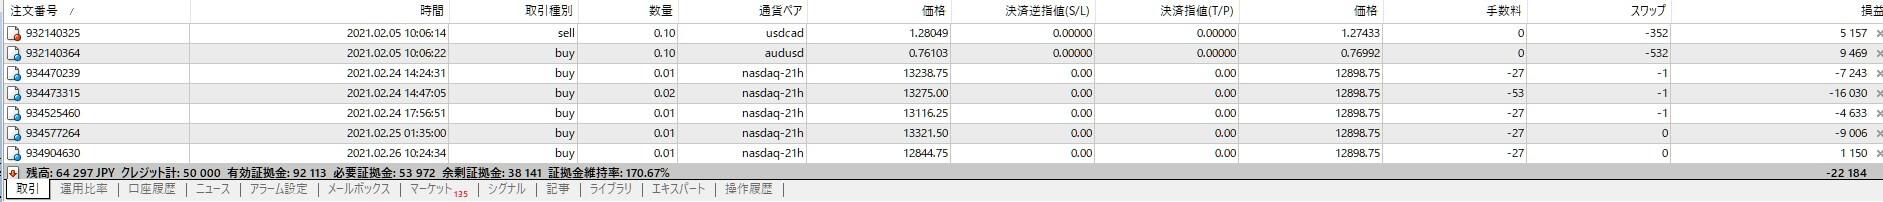 10-FBS-豪ドルUSD-ドルカナダ-0-1枚-ロングとショート-含み益-ポジション状況